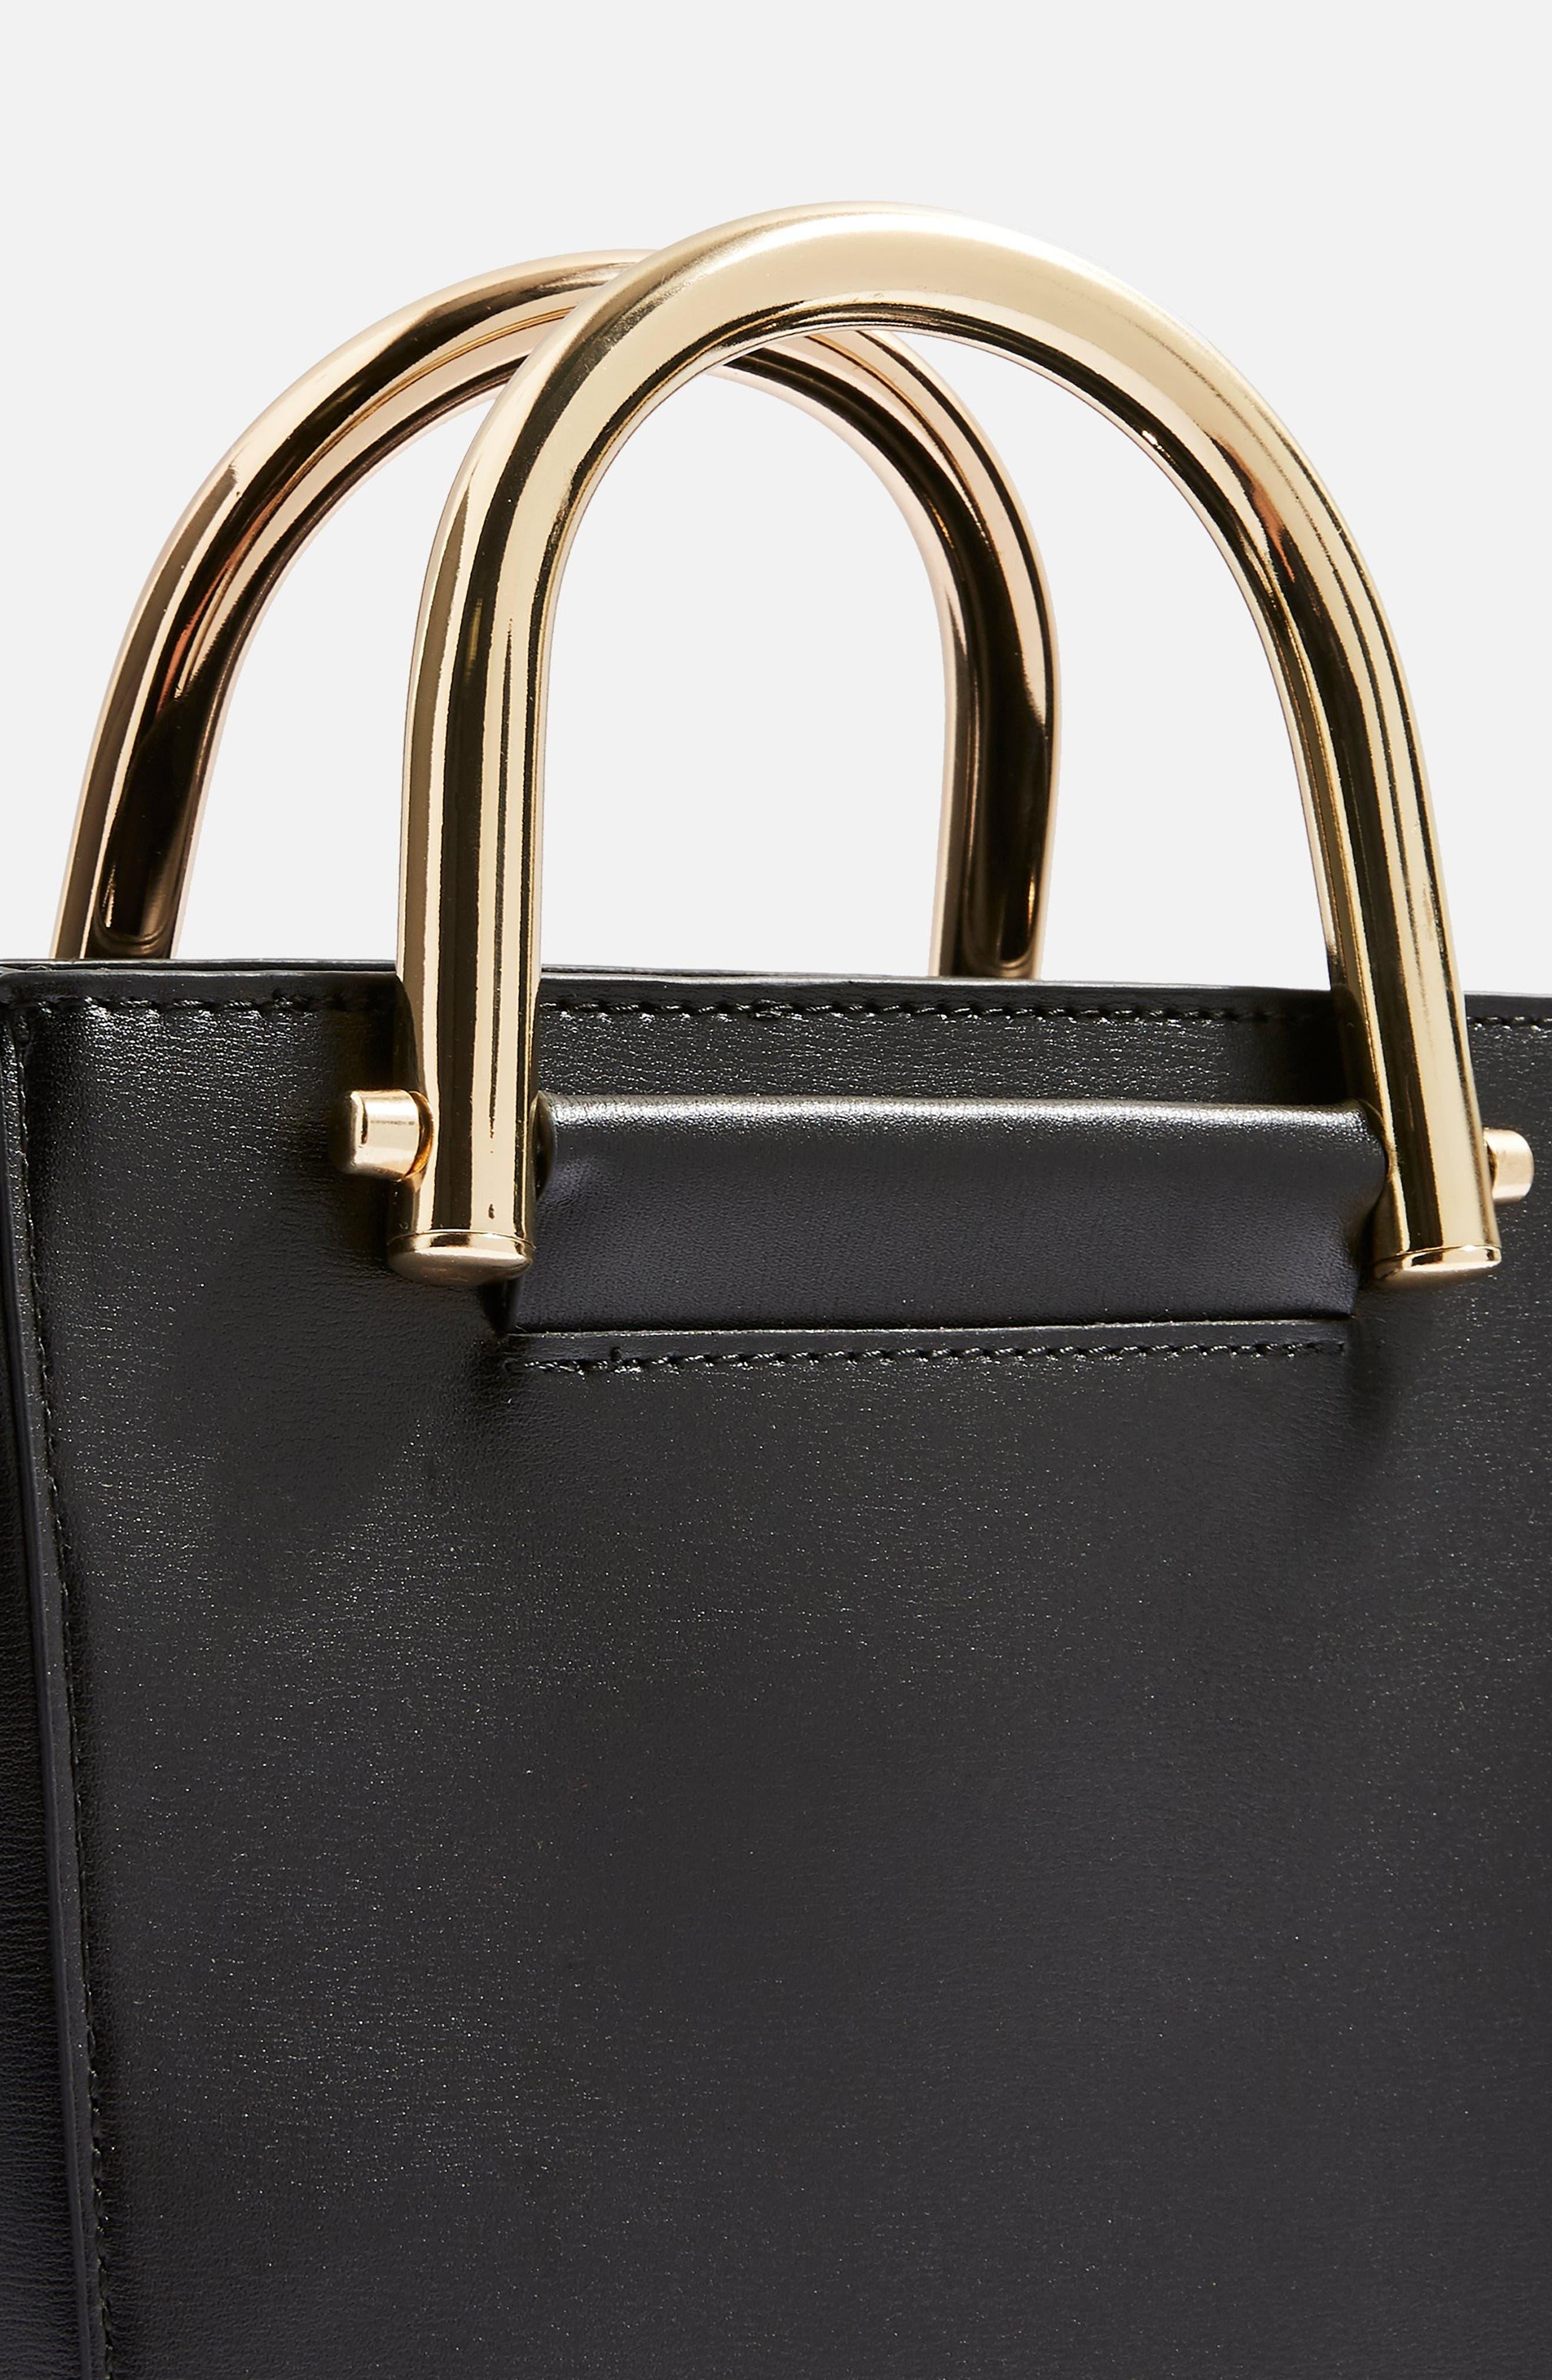 TOPSHOP,                             Lacey Metal Top Handle Shoulder Bag,                             Alternate thumbnail 4, color,                             001